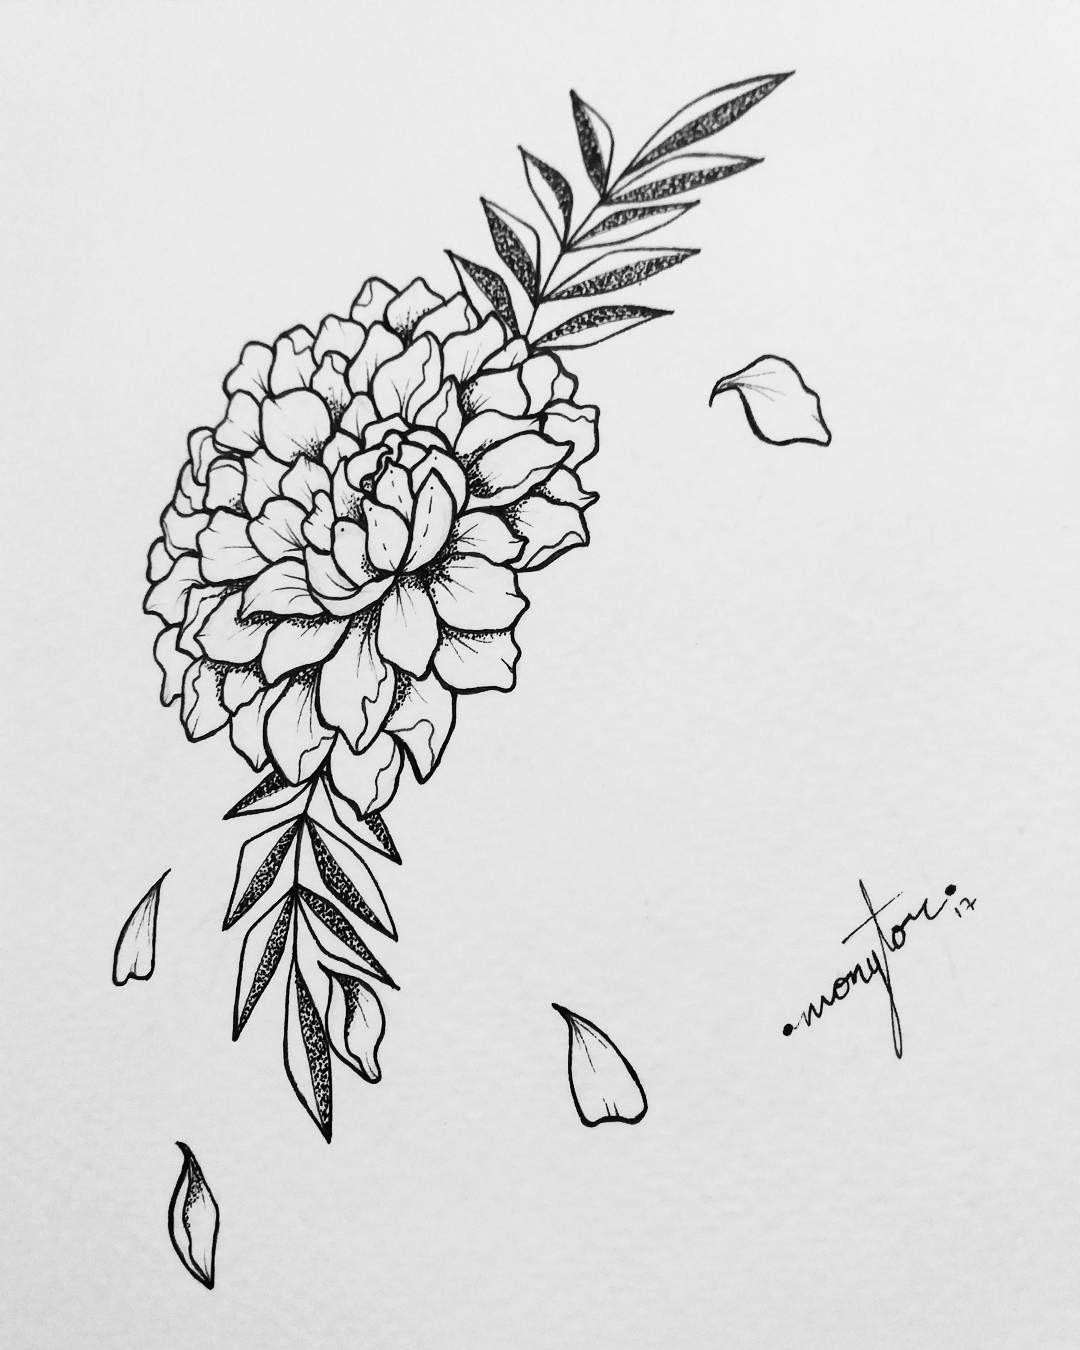 Monytor Ink En Instagram Tinta Ilustracion Illustration Marker Markermicron Micron Microna Flor Cempasuchil Calaveras Flores Tatuajes Florales